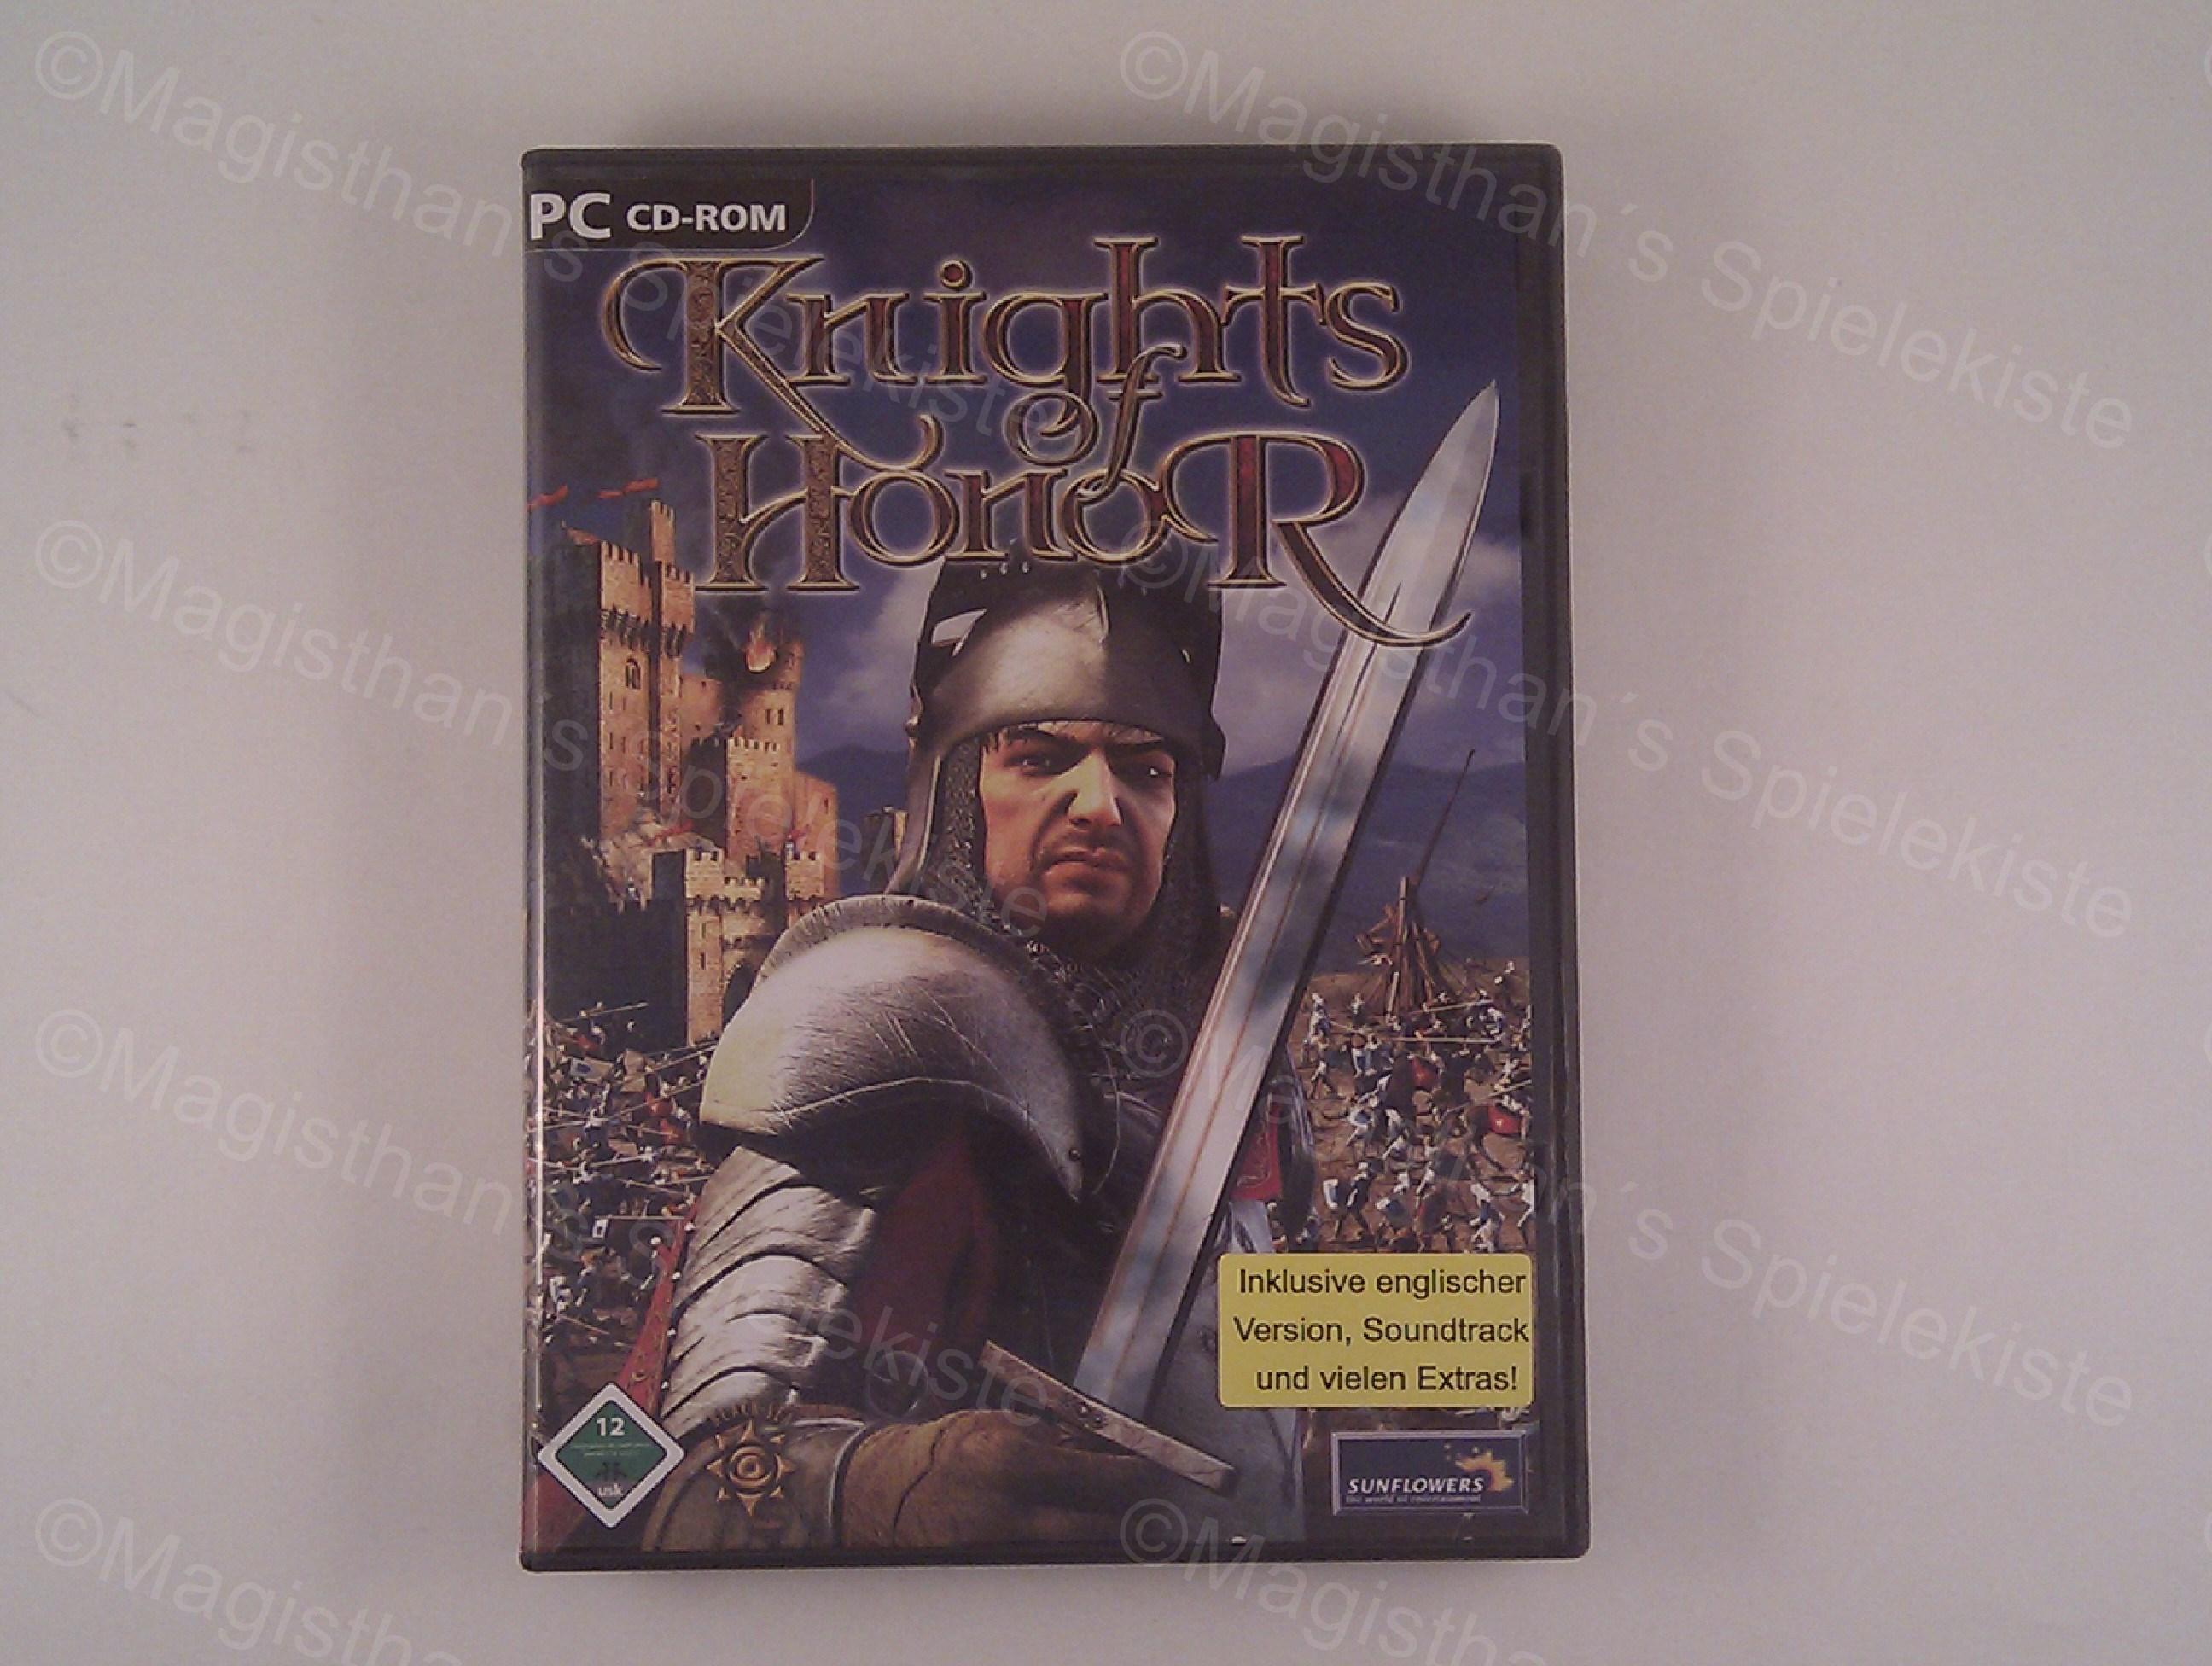 KnightsHonor1.jpg